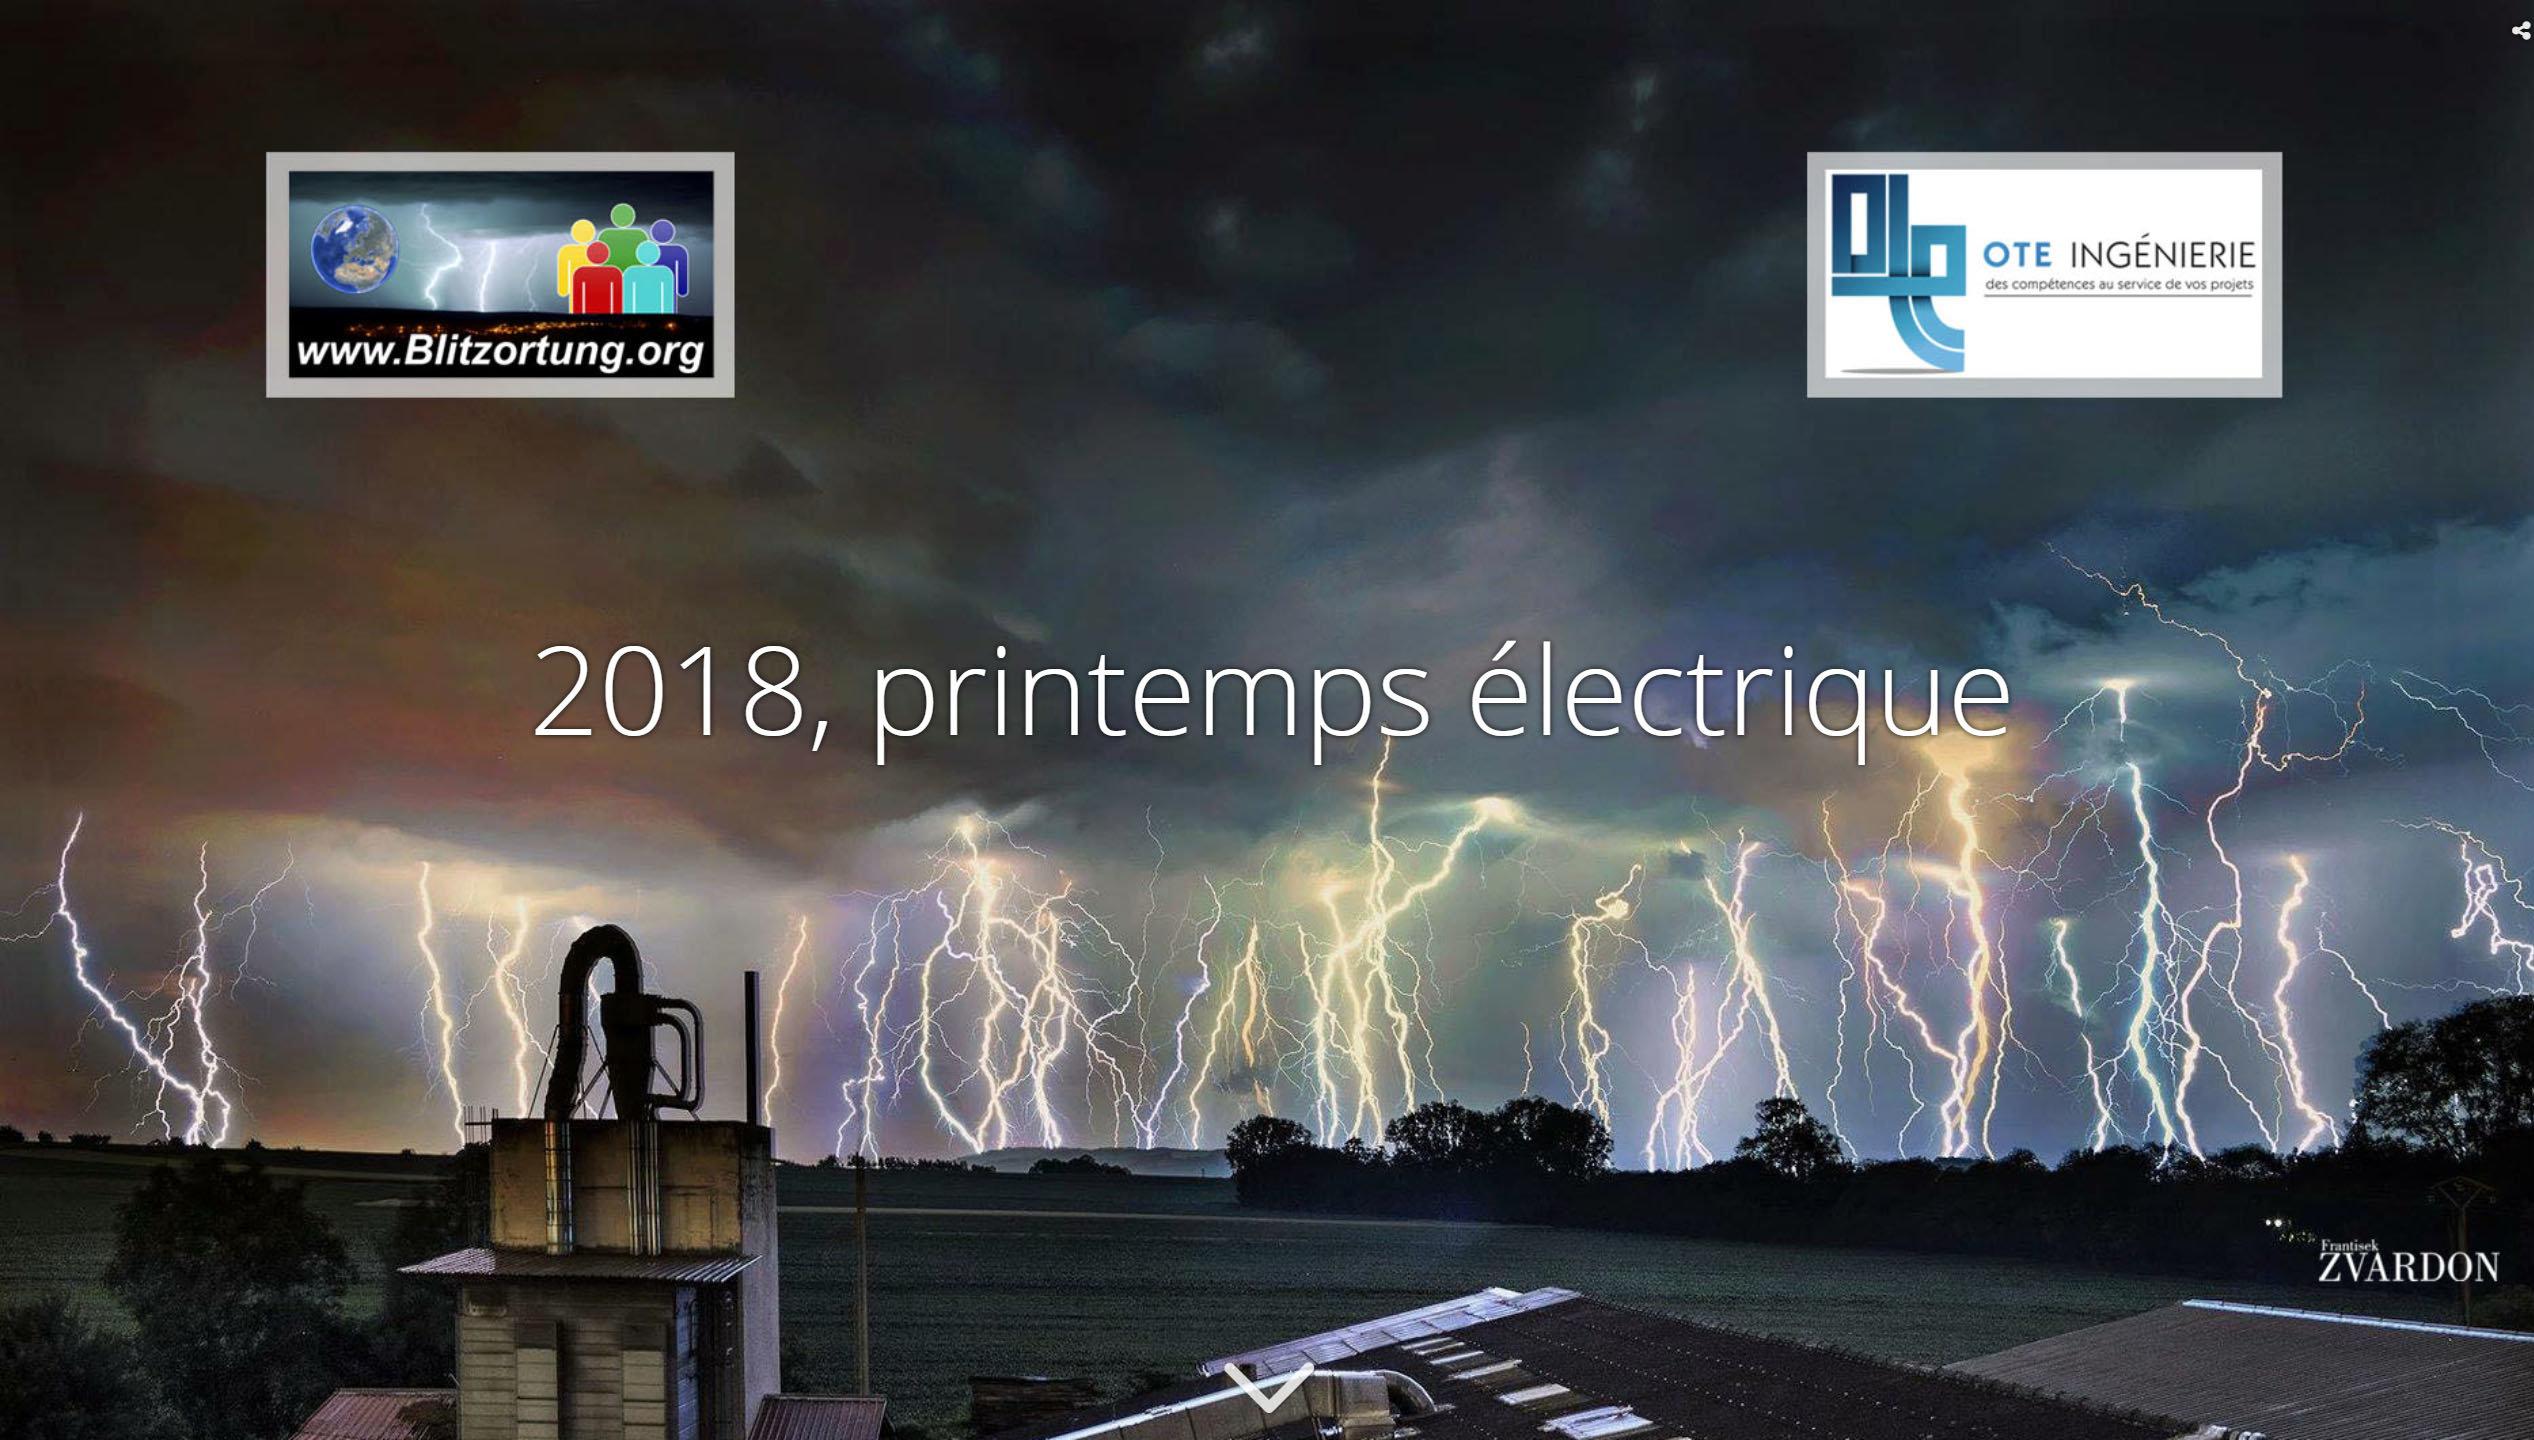 2018 printemps electrique ote ingenierie e1564046091188